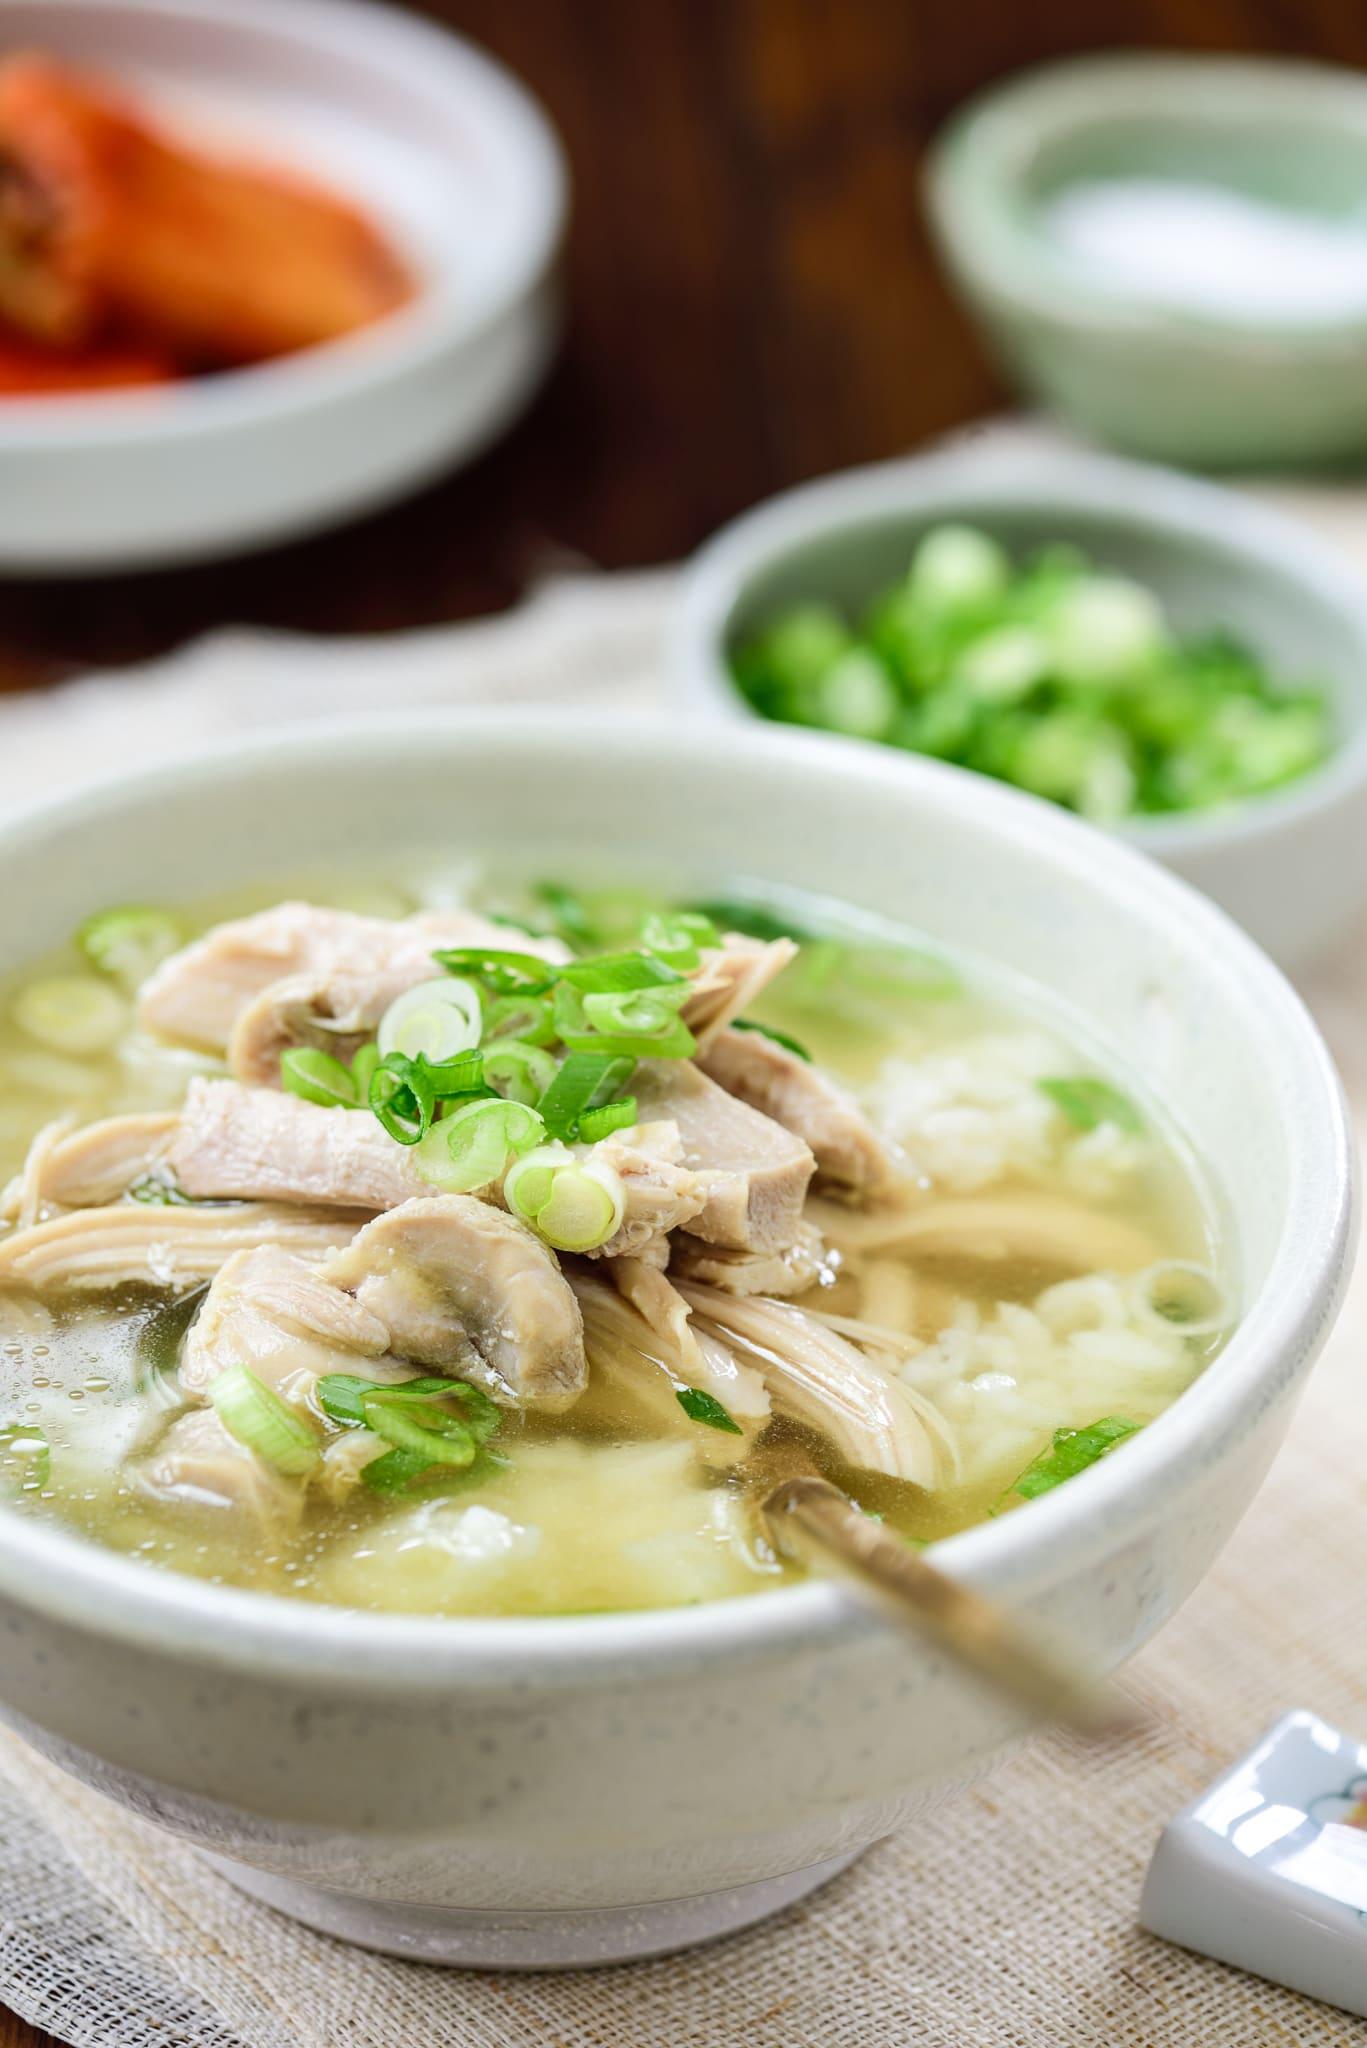 DSC9686 - Dak Gomtang (Korean Chicken Soup)